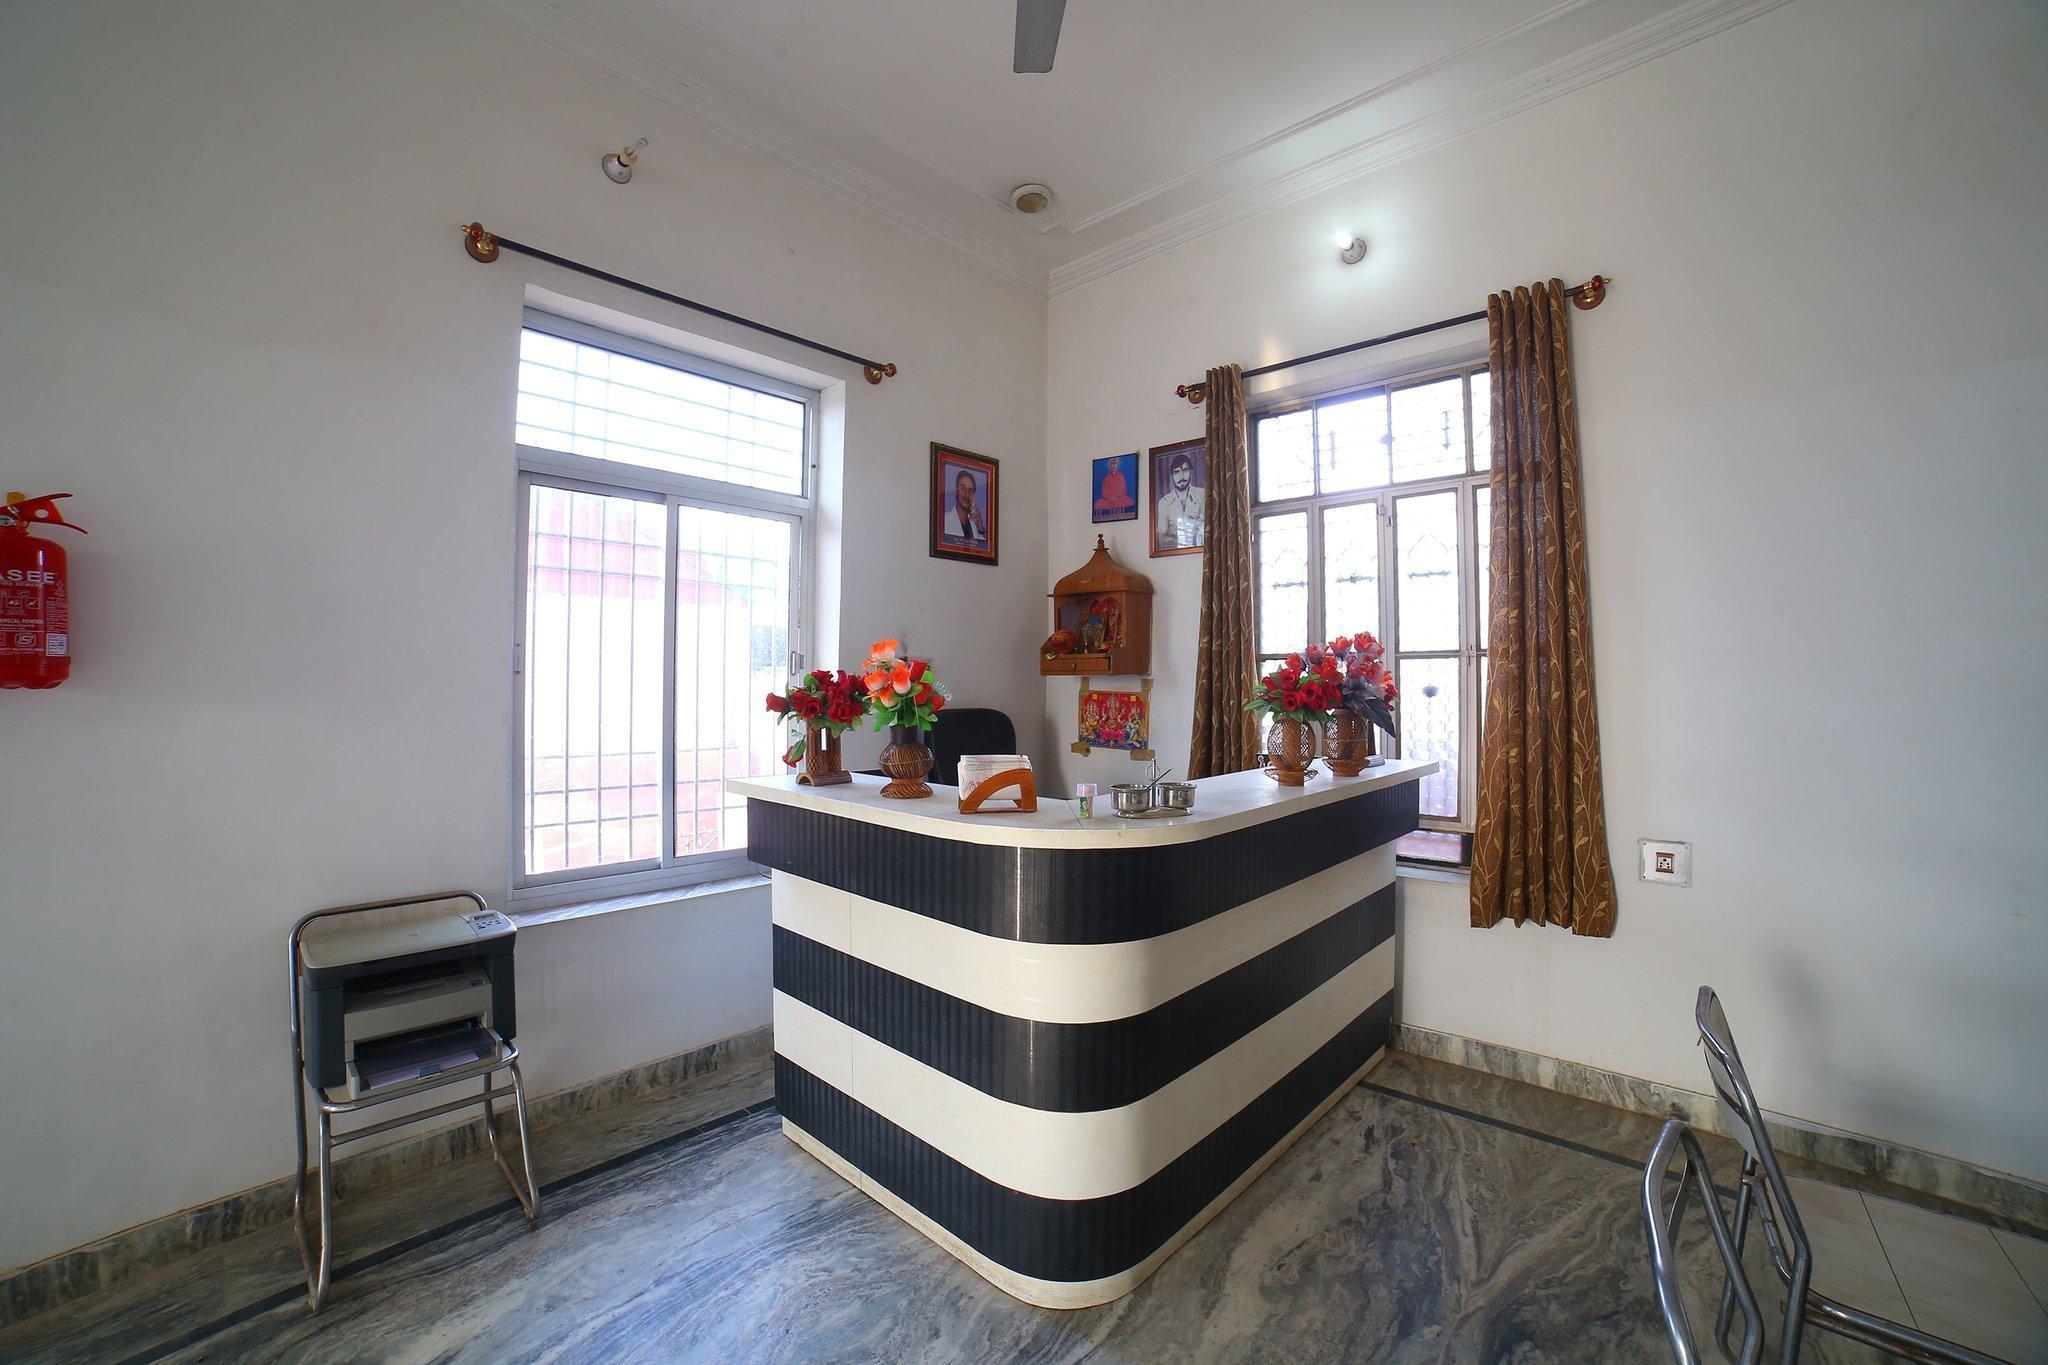 OYO 40049 Shri Krishnam Hotel & Restaurant, Sikar